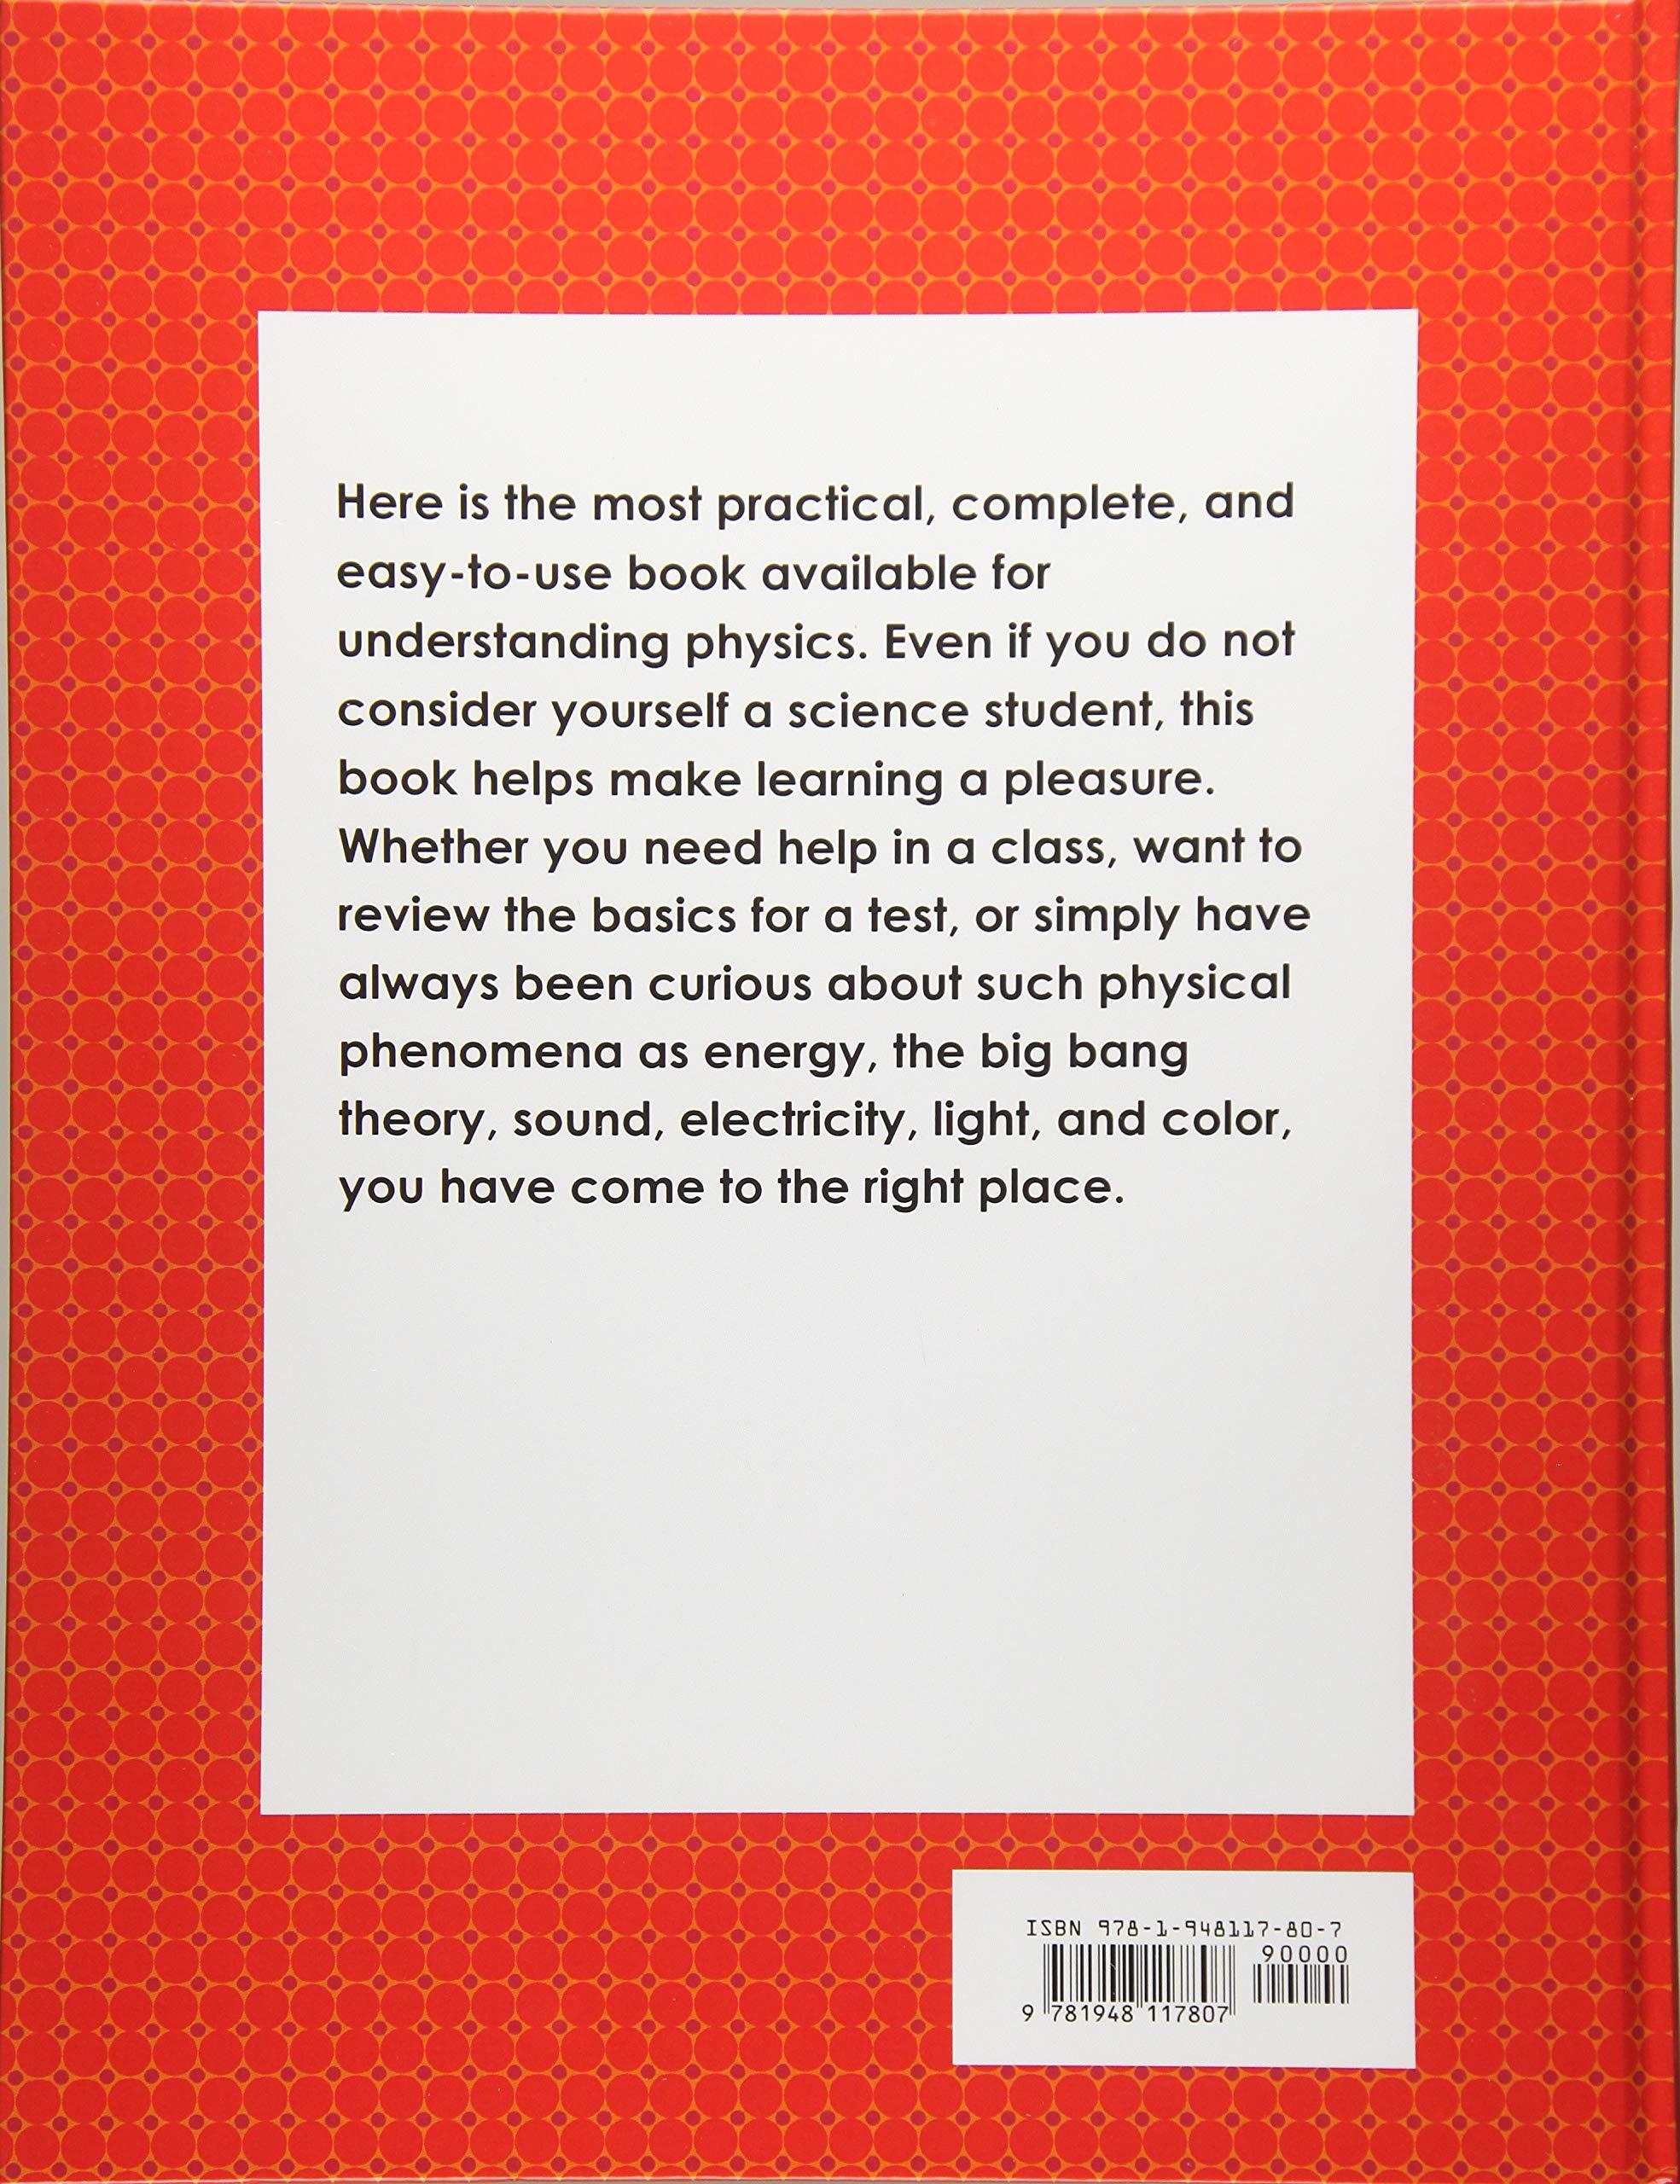 Basic Physics: A Self-Teaching Guide: K Kuhn: 9781948117807: Amazon.com:  Books